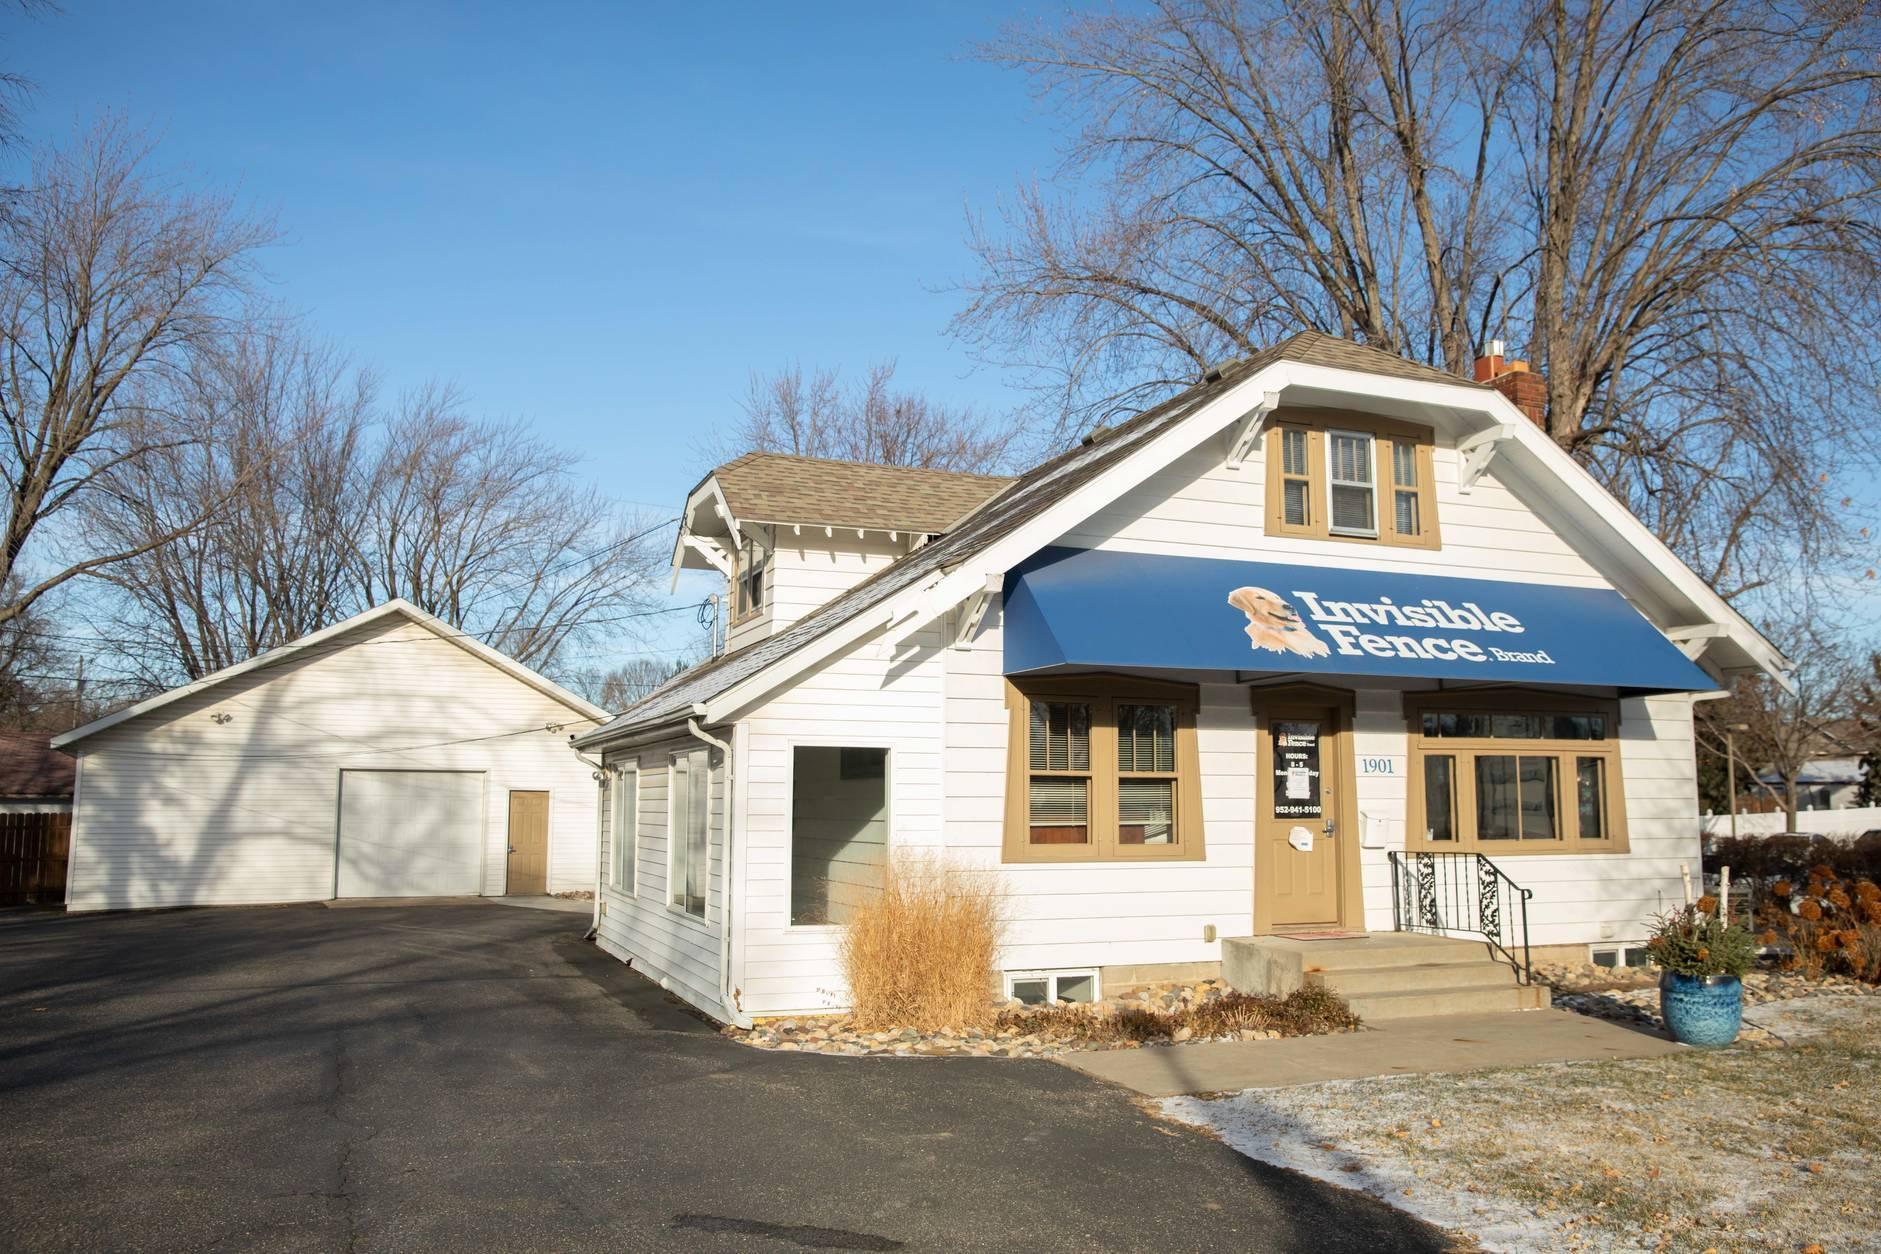 5690056 Property Photo